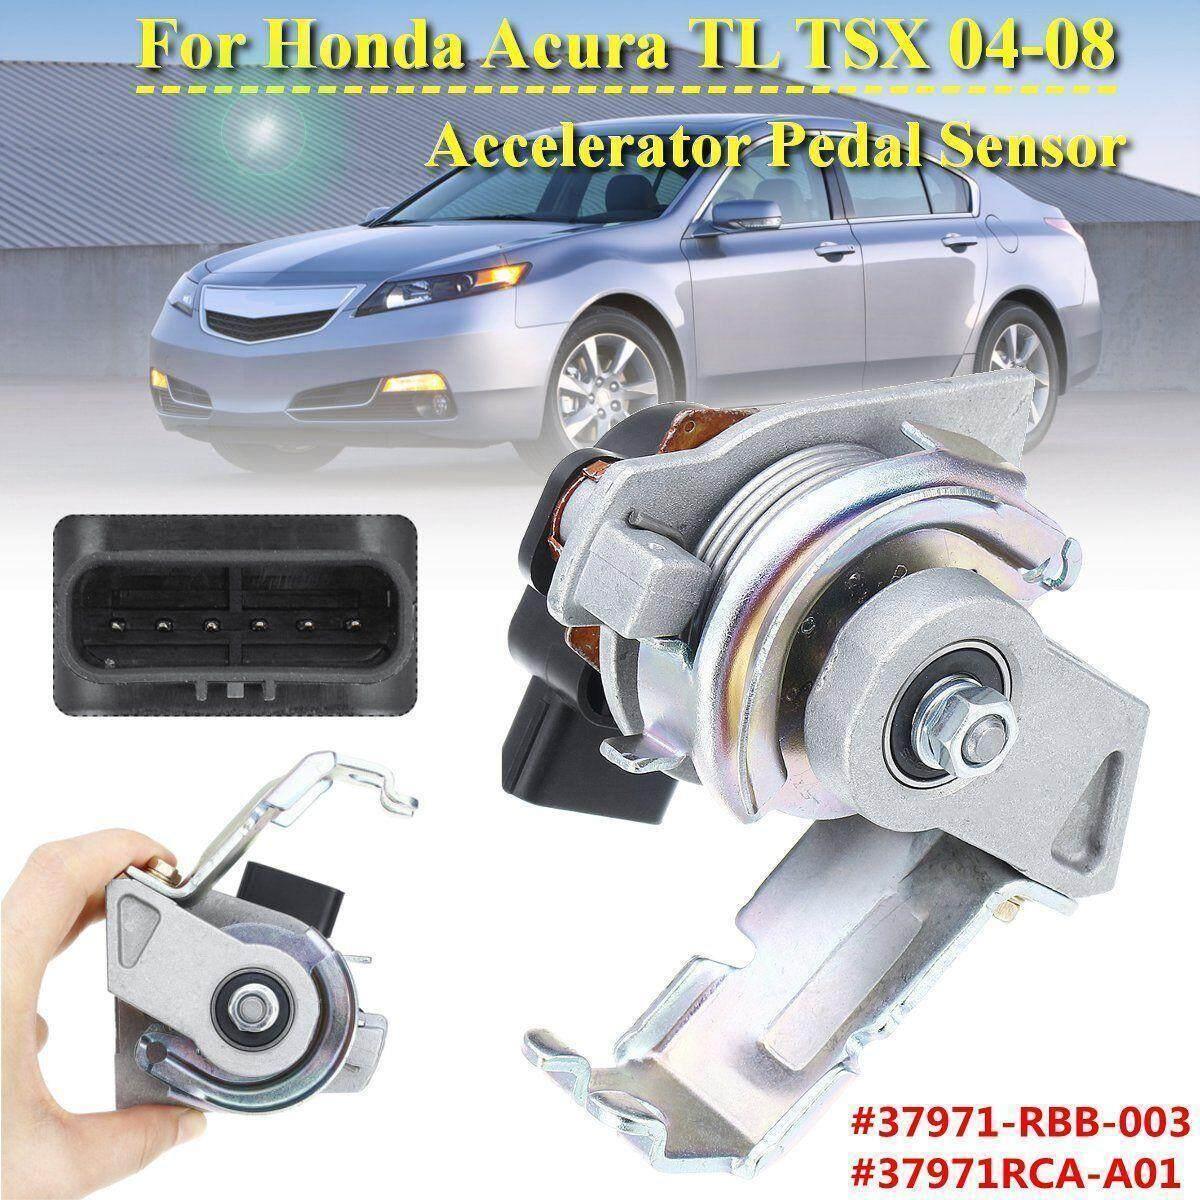 【Free Shipping + Flash Deal】Accelerator Pedal Sensor For Honda Acura TL TSX  04-08#37971-RBB-003 37971RCA-A01